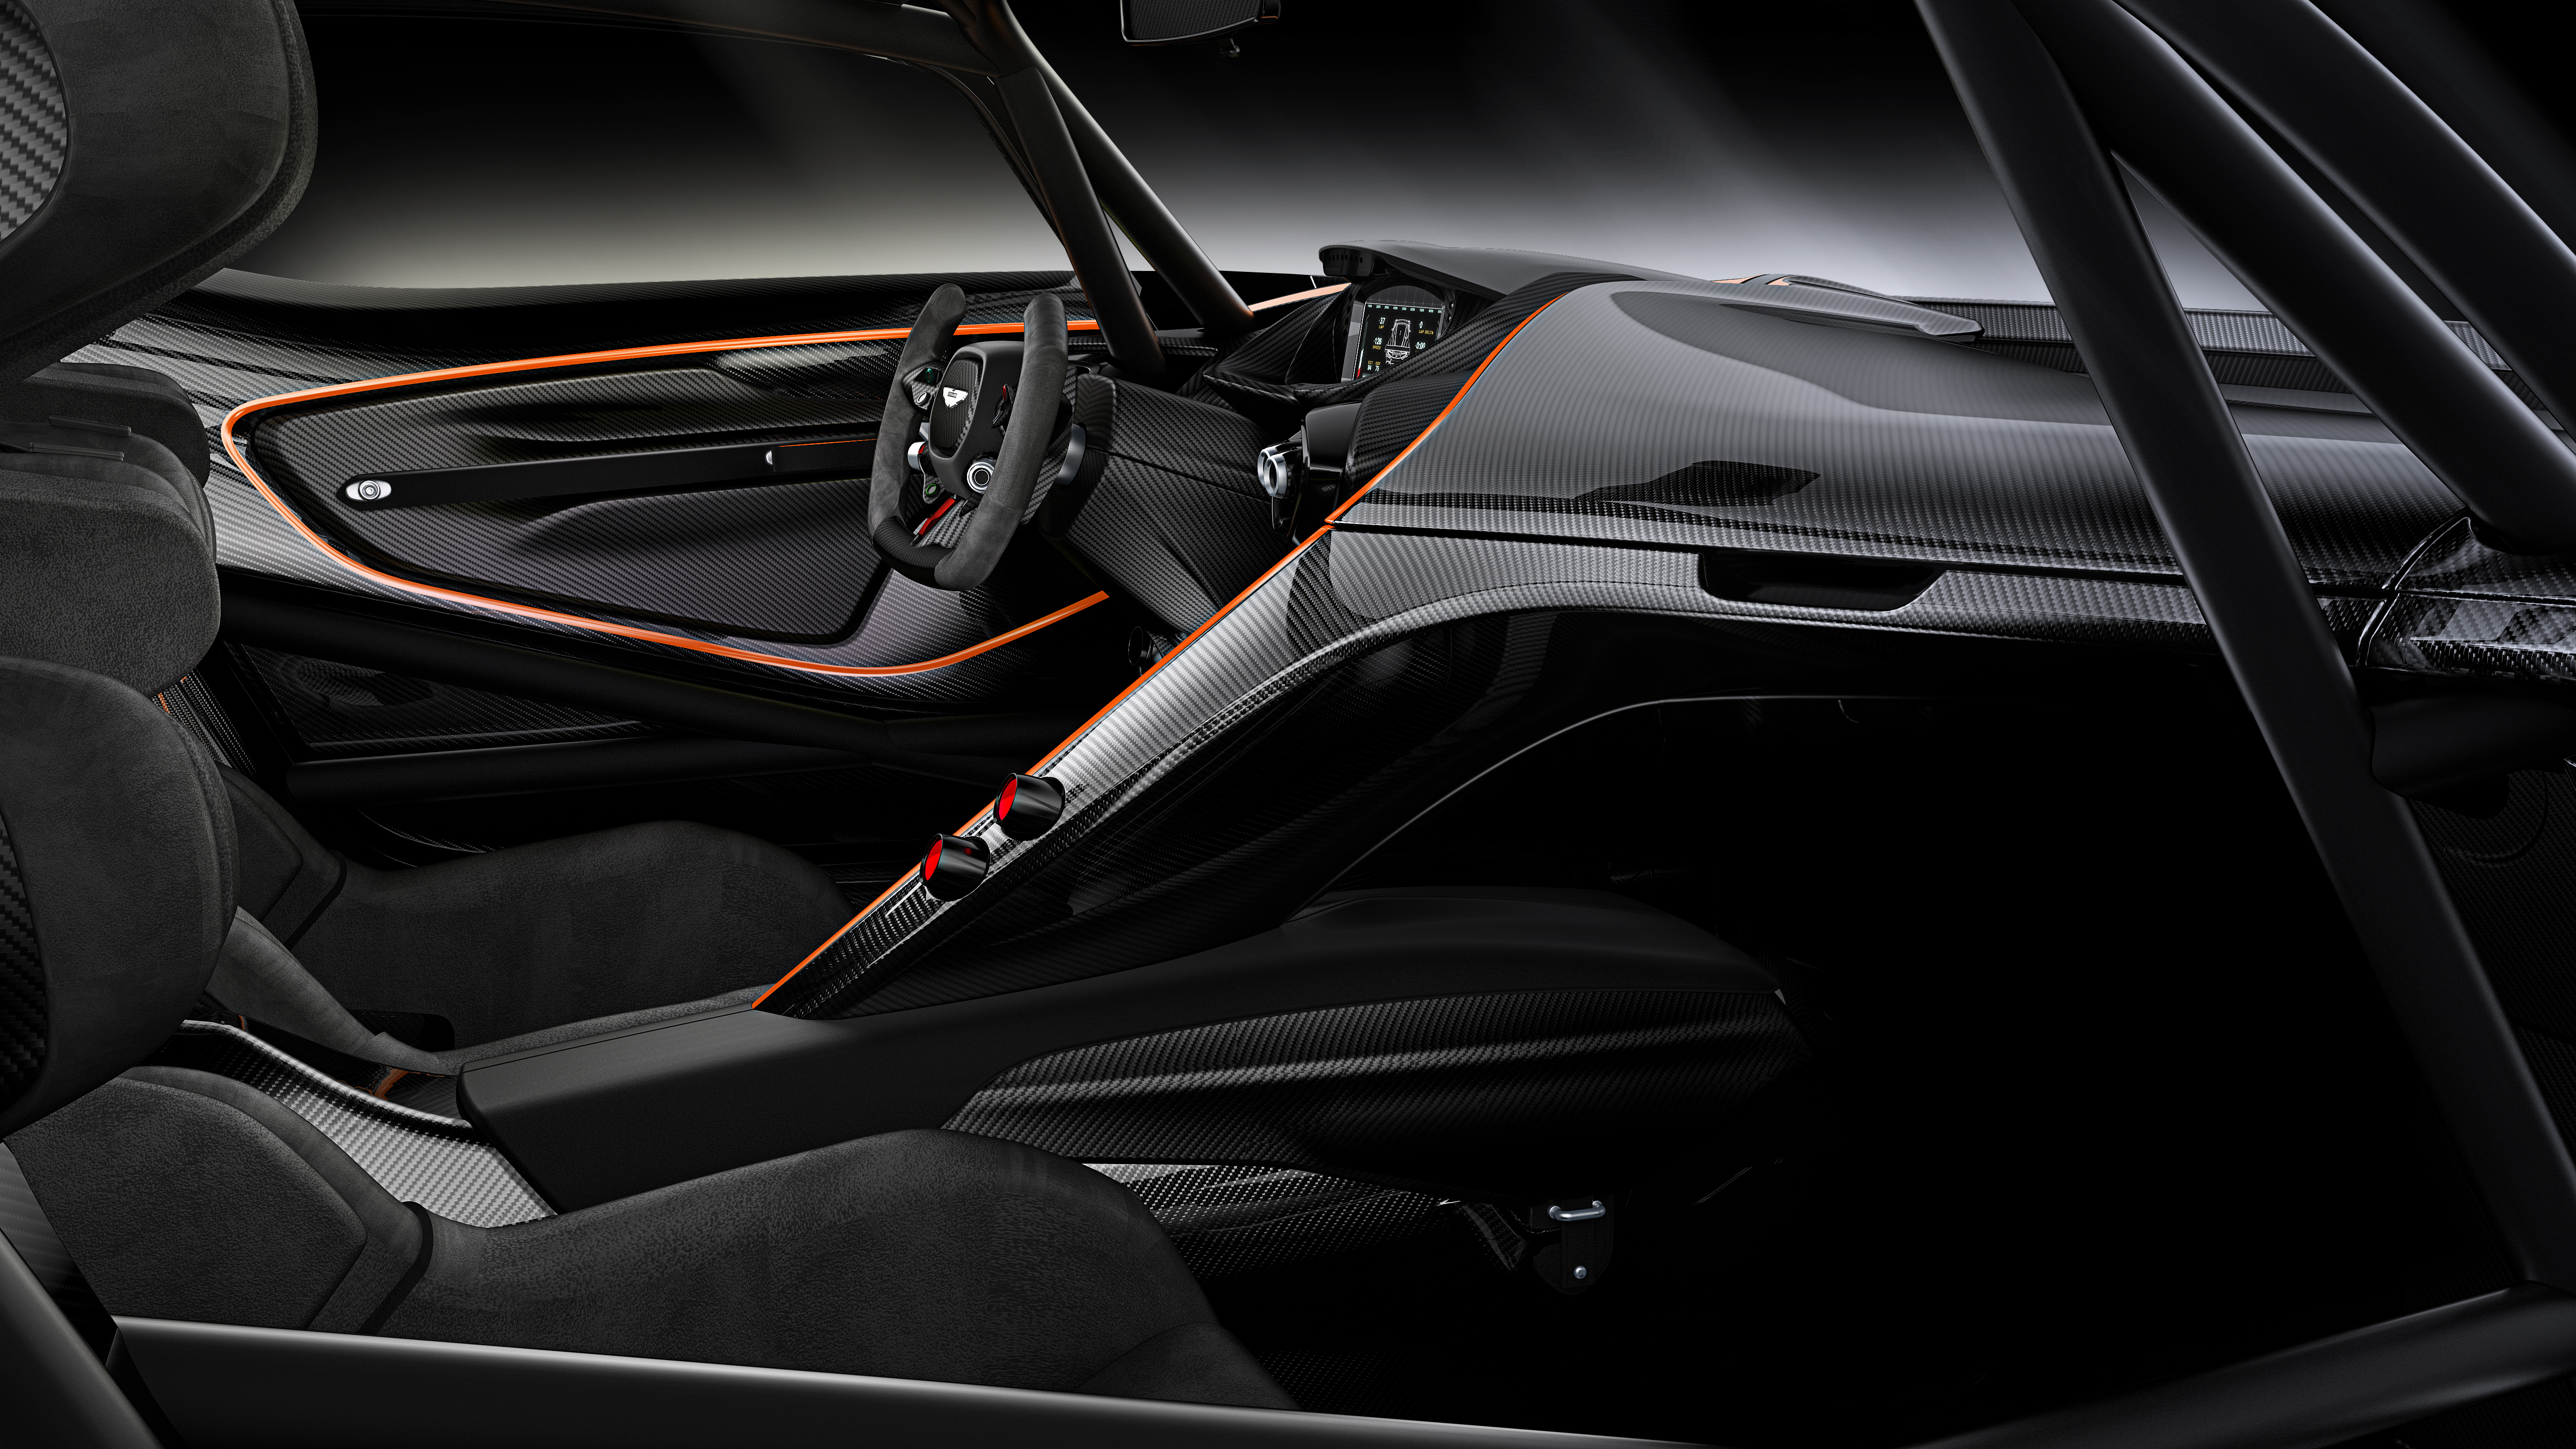 Aston Martin Vulcan Debuts With 800 Hp 7 0 Litre V12 Image